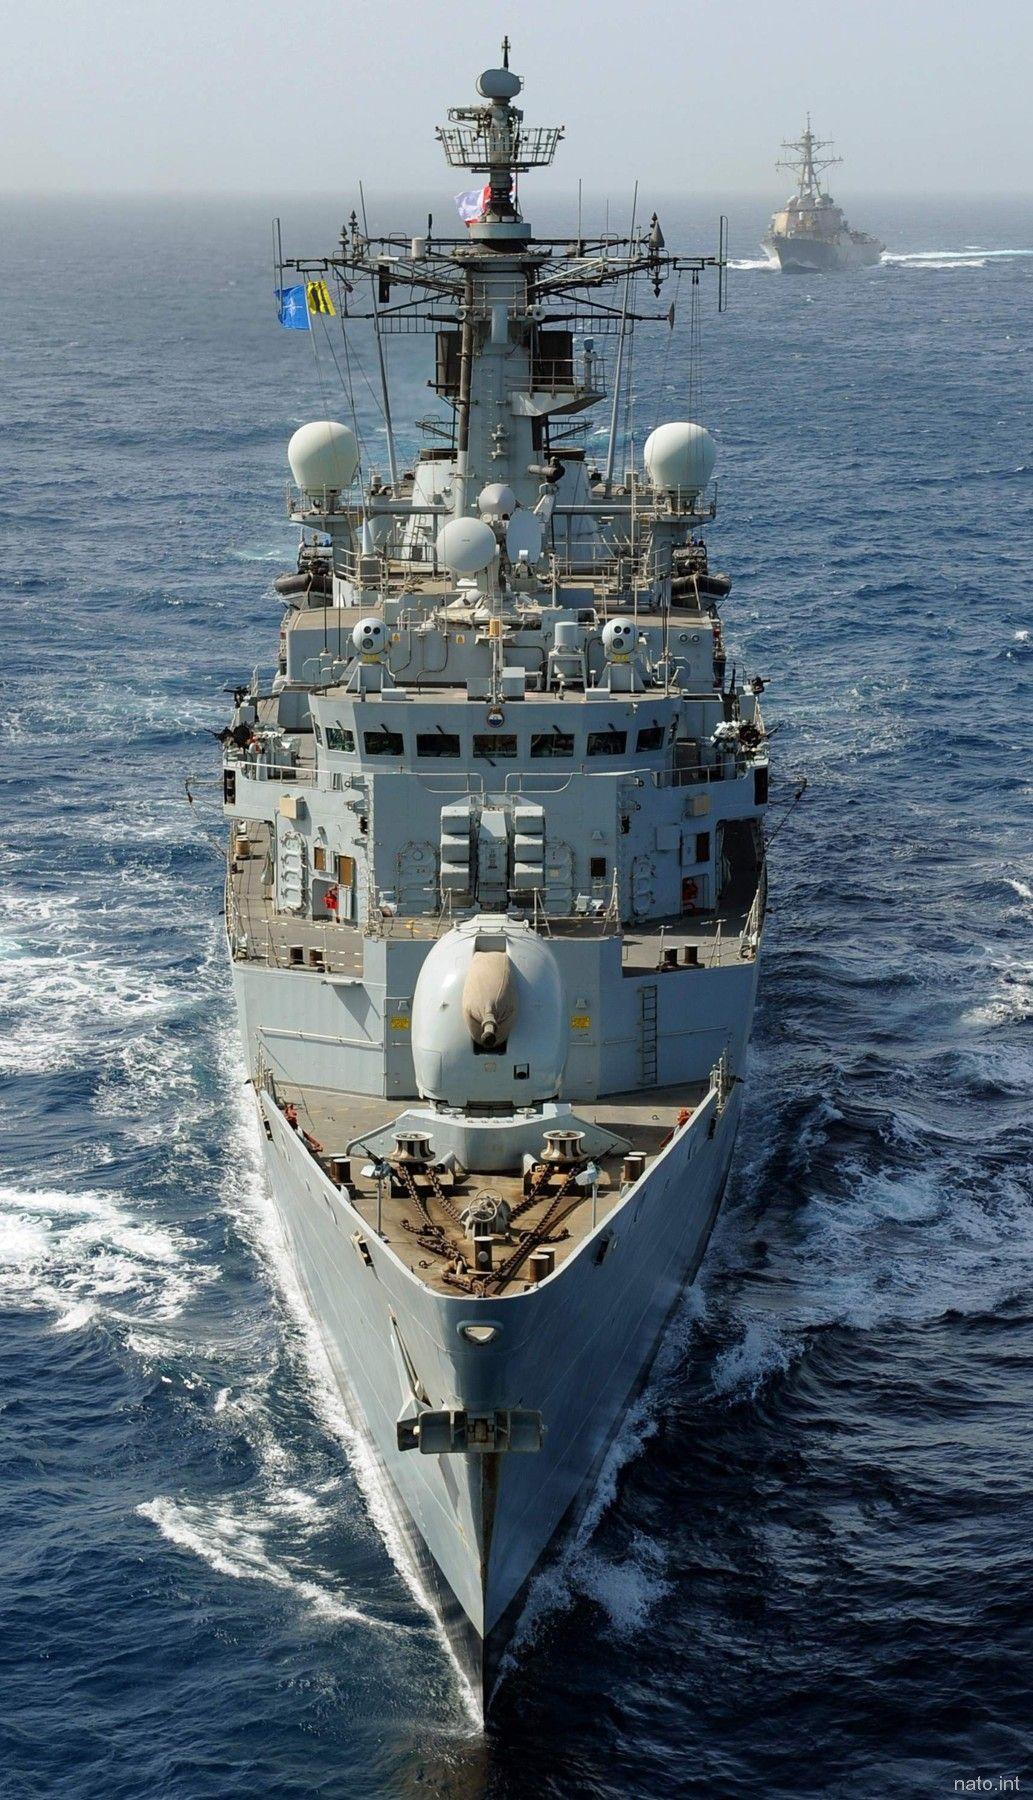 Hms Chatham F 87 Type 22 Broadsword Class Guided Missile Frigate Royal Navy Royal Navy Ships Royal Navy Old Sailing Ships